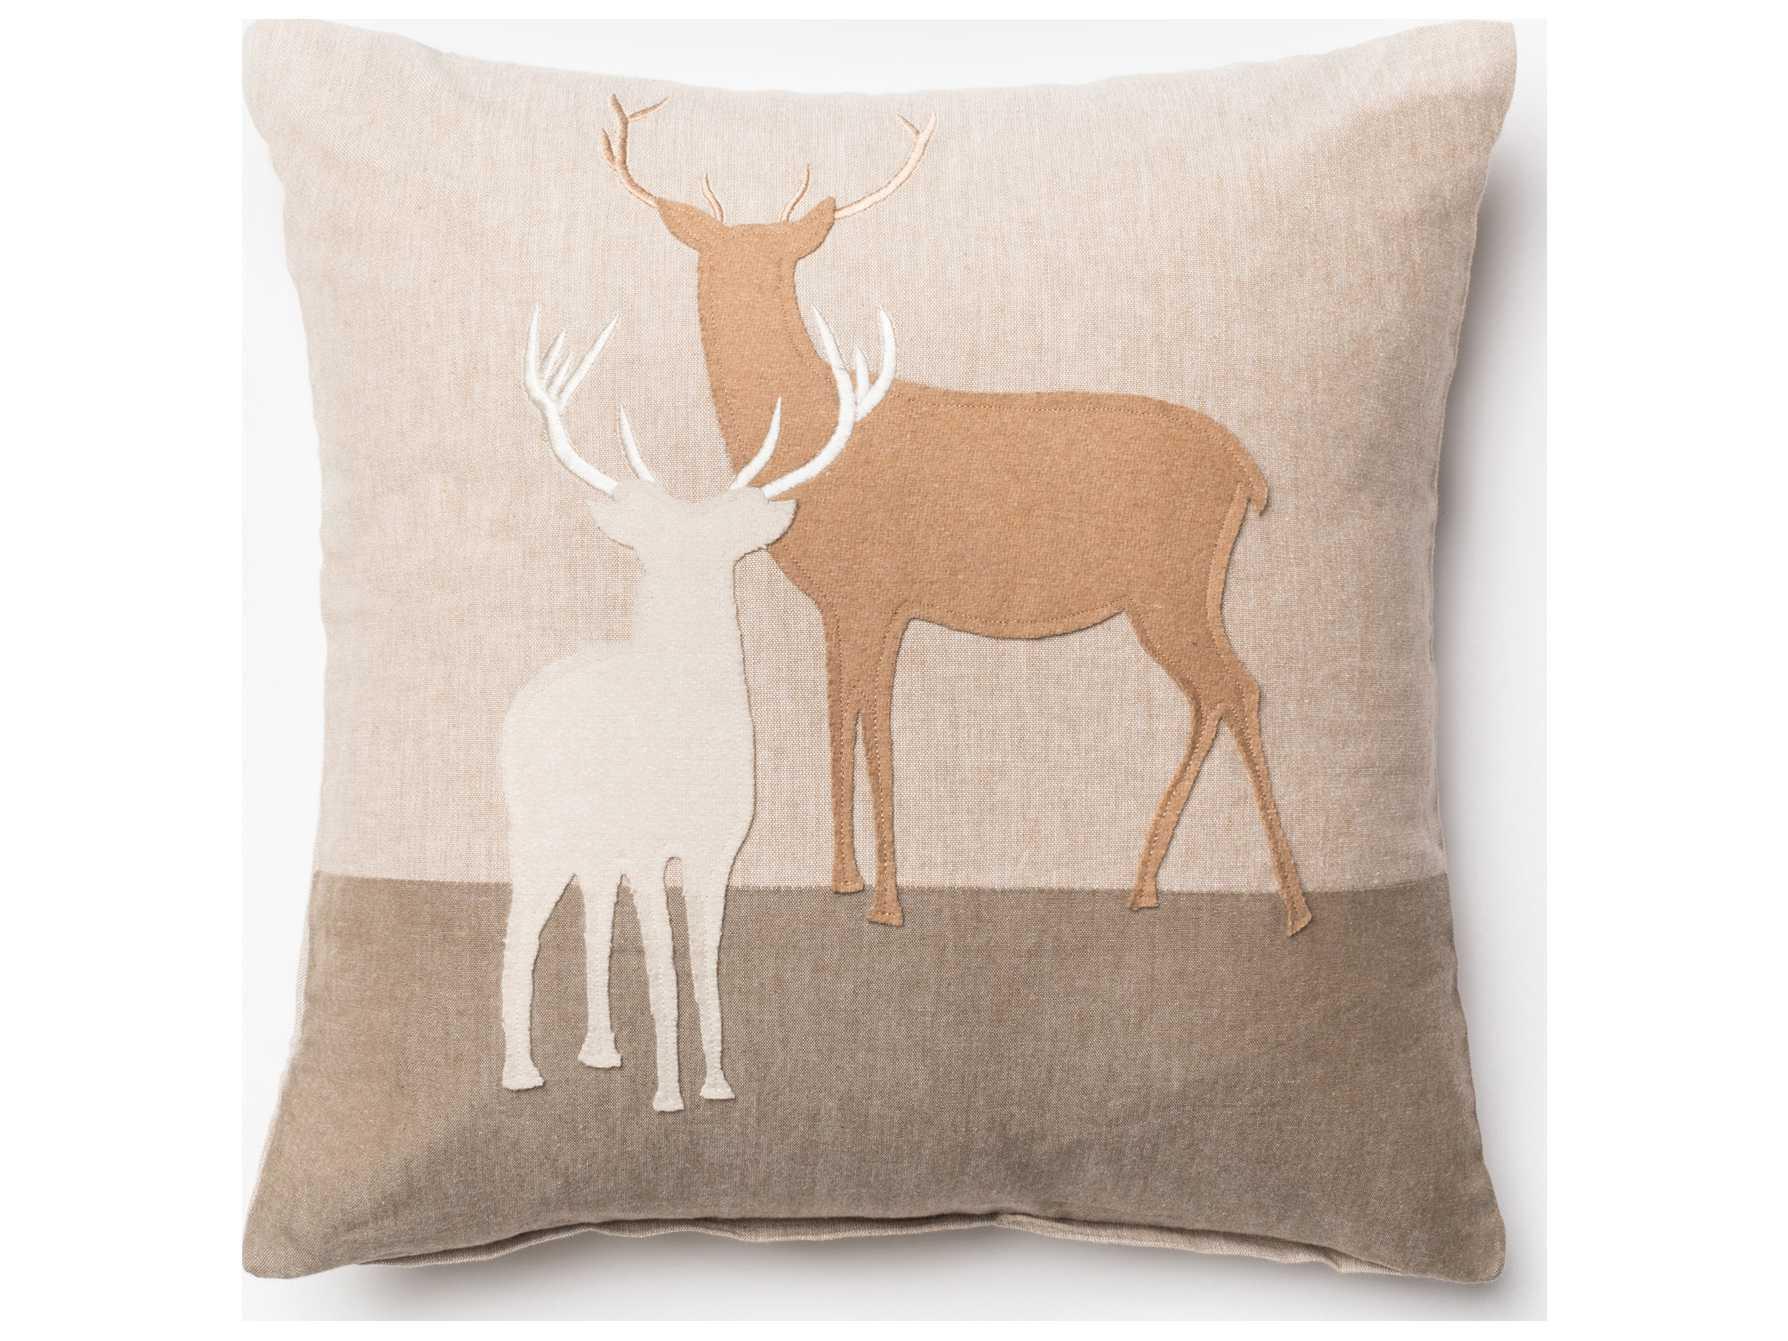 Loloi Rugs 18 39 39 Square Beige Pillow P0151bemlpil1